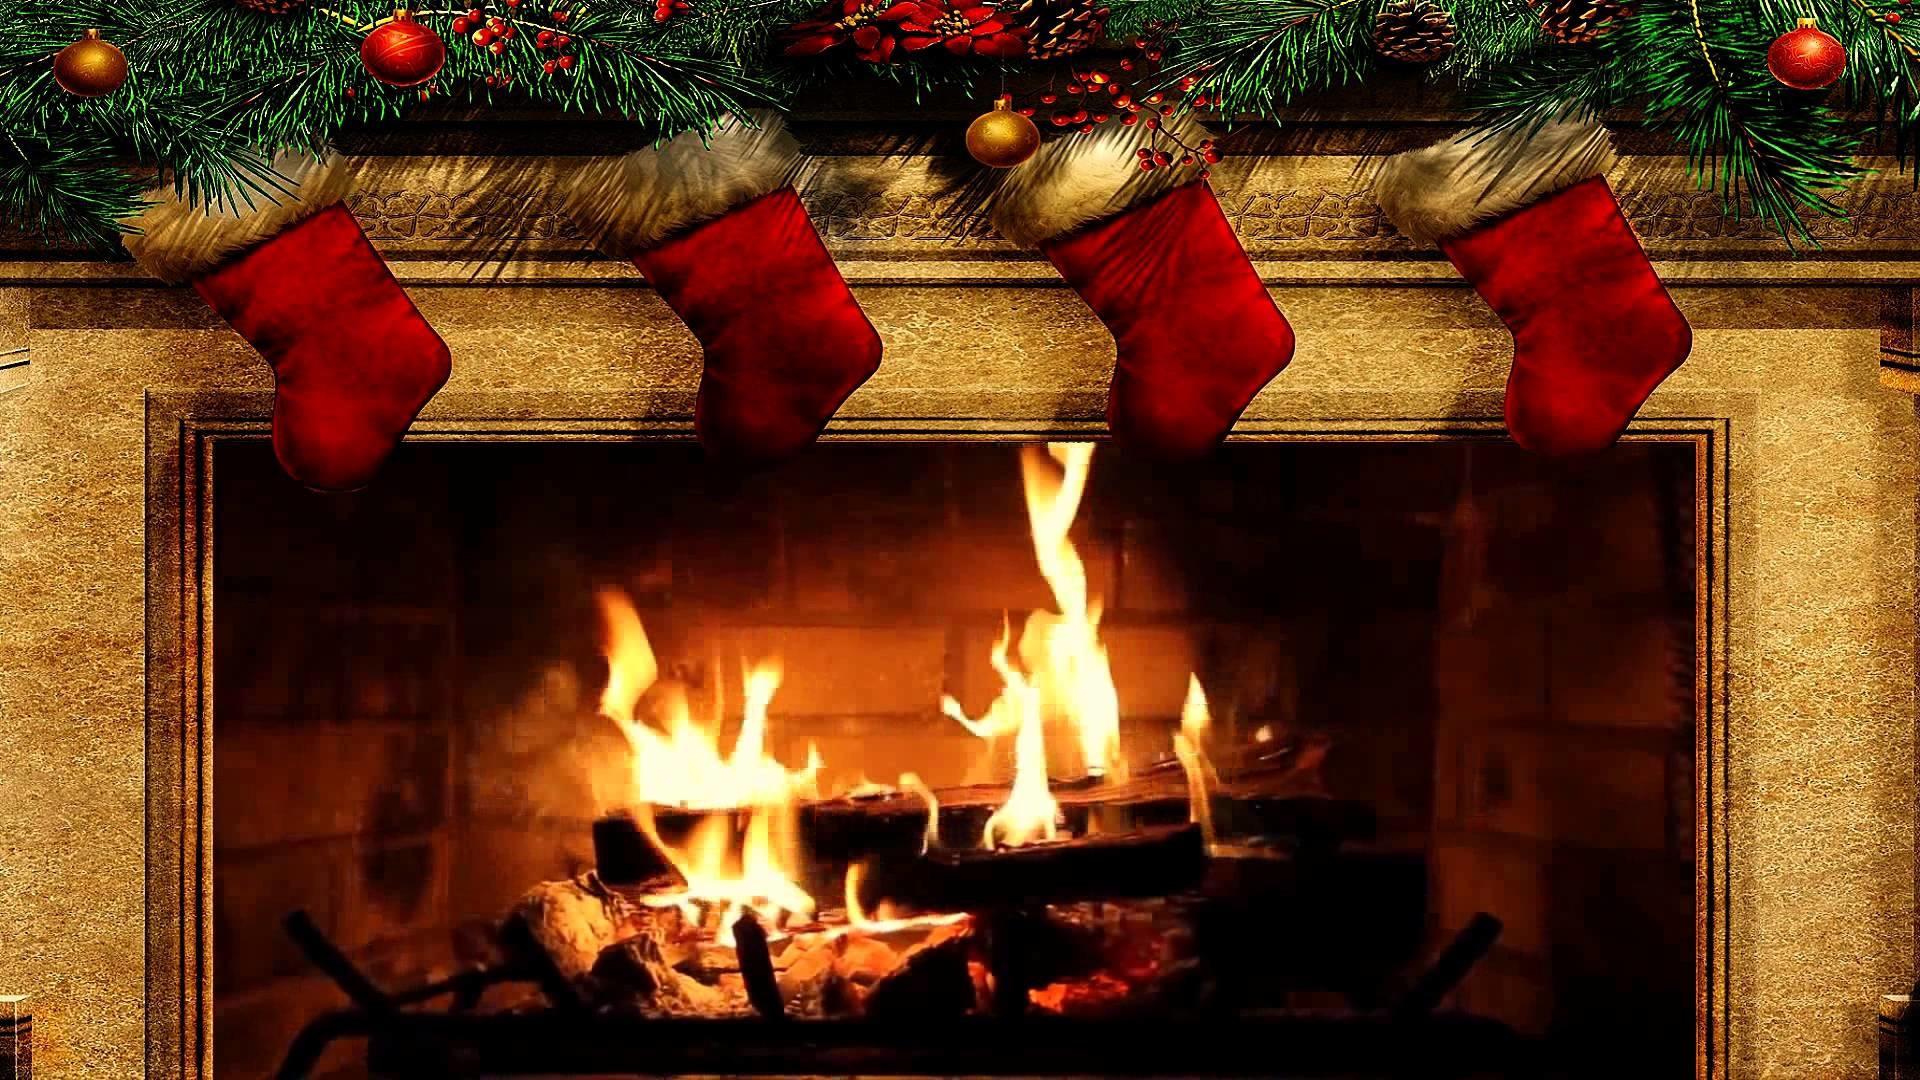 Christmas Wallpaper Fireplace  Christmas Fireplace Wallpaper 57 images